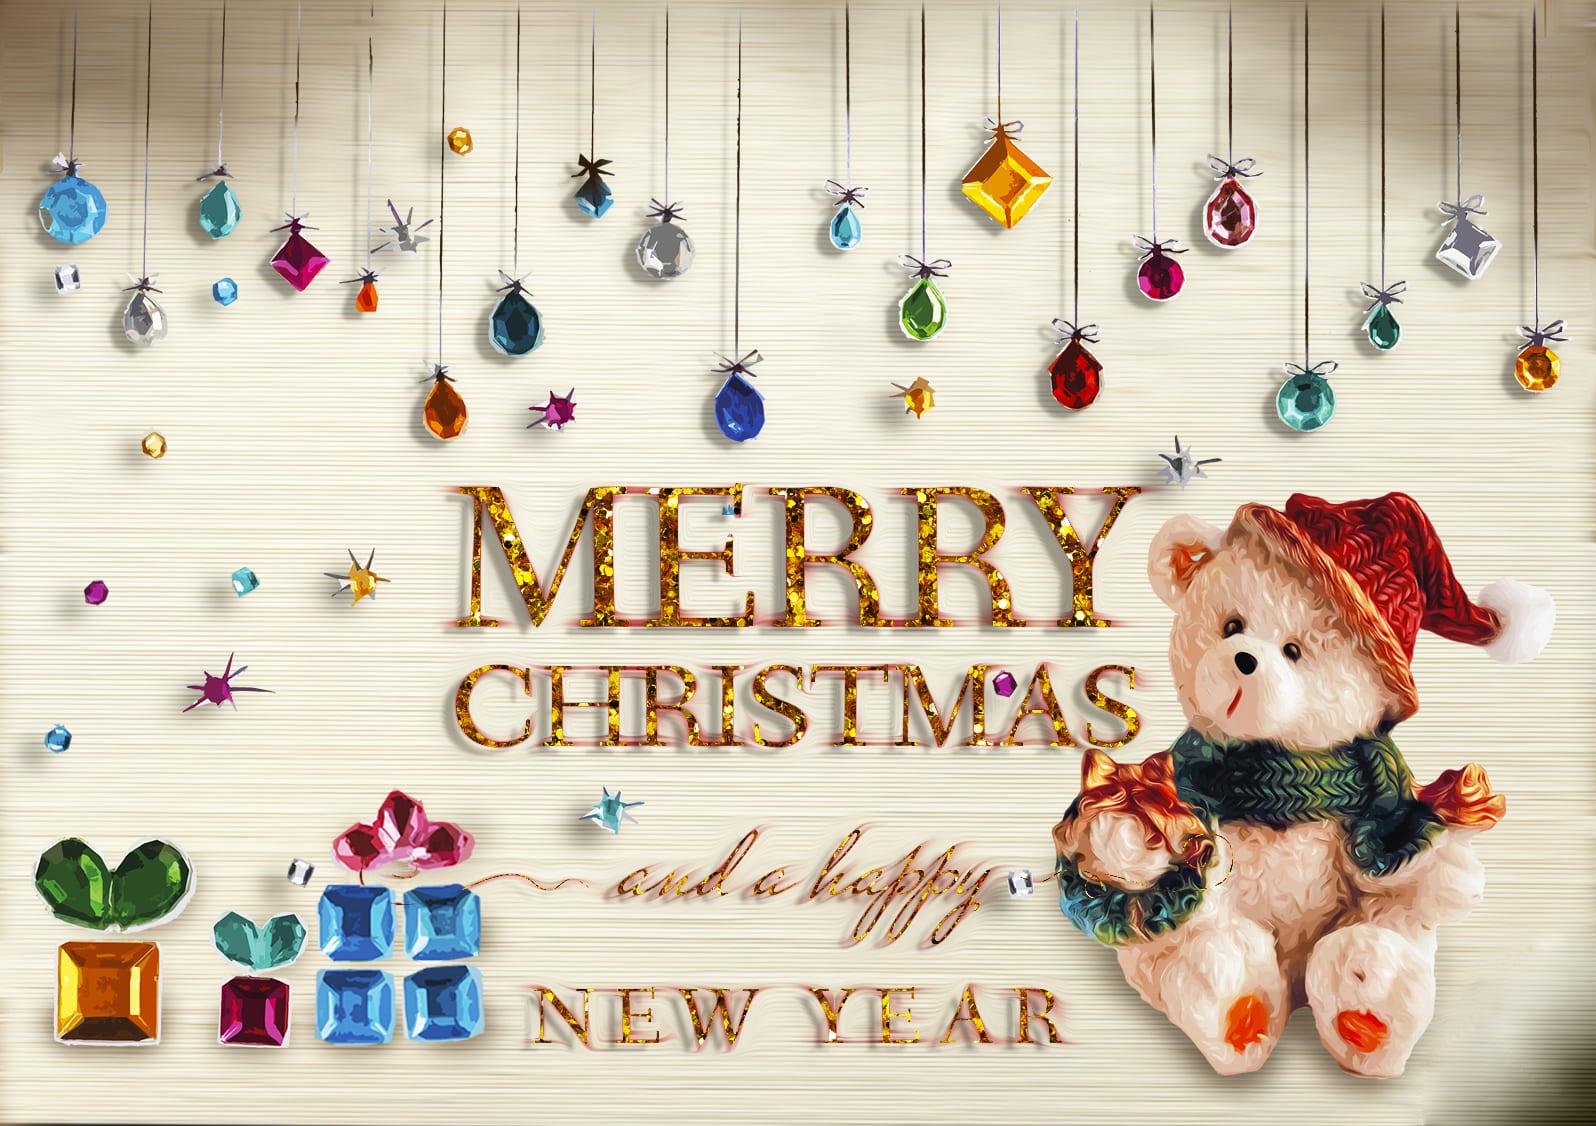 496 Christmas Illustrations: Christmas Vectors Bundle SVG, EPS, AI - h